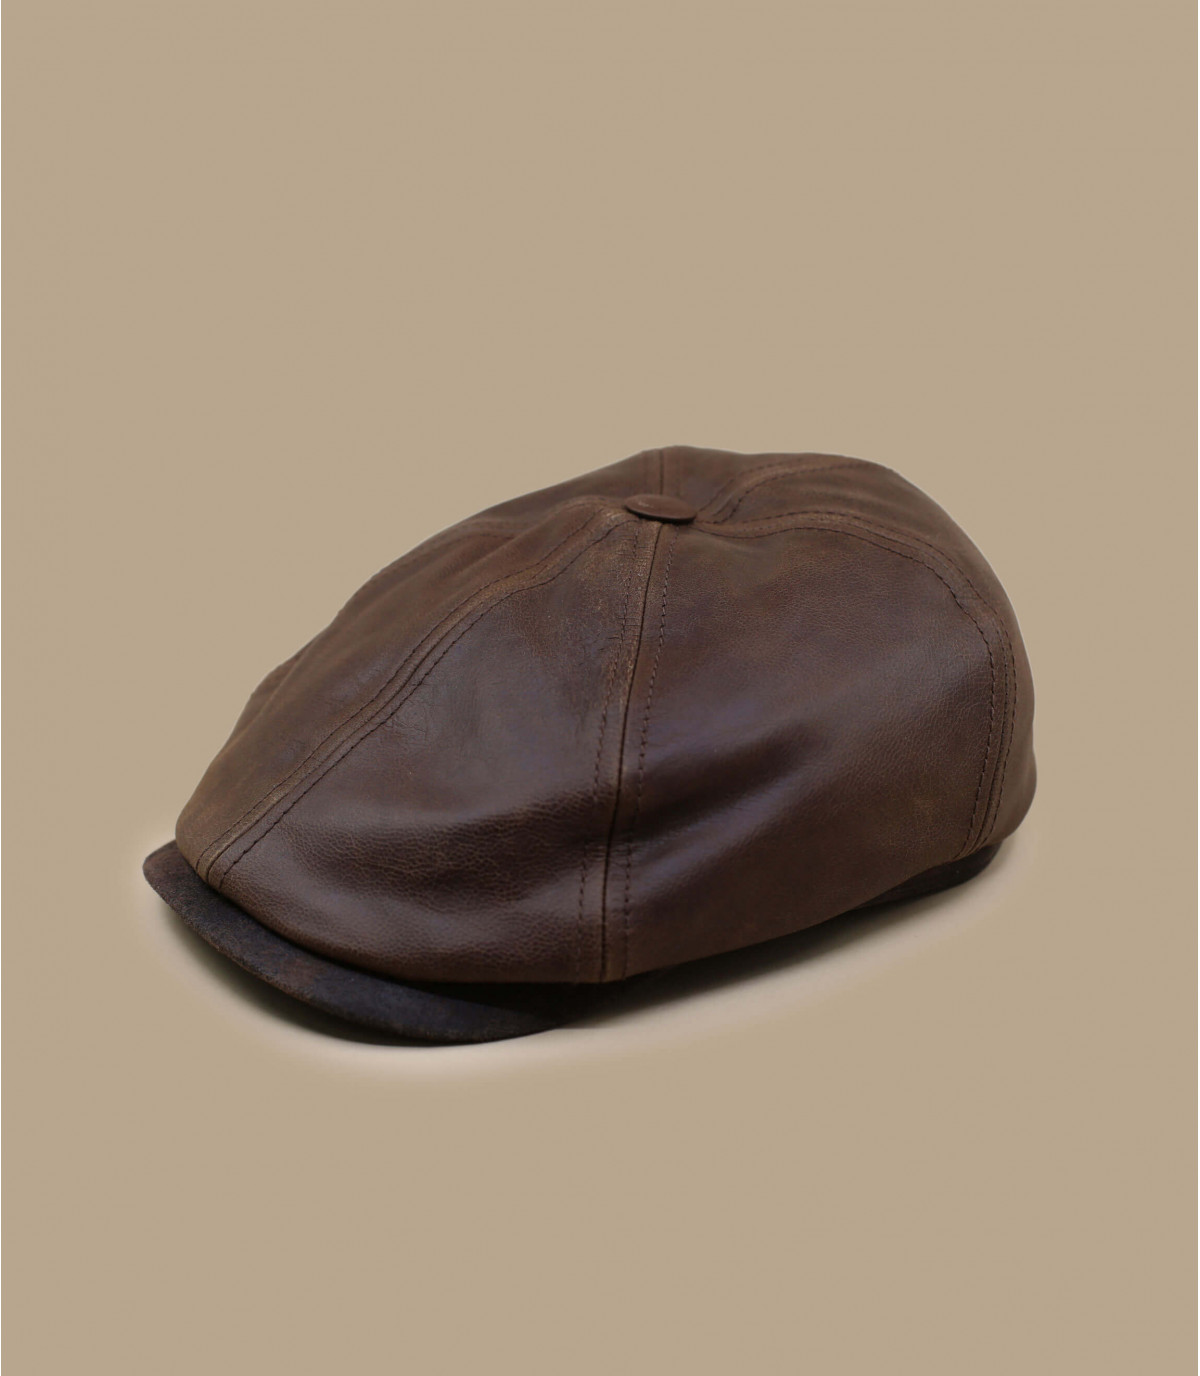 Gorra irlandaise cuir